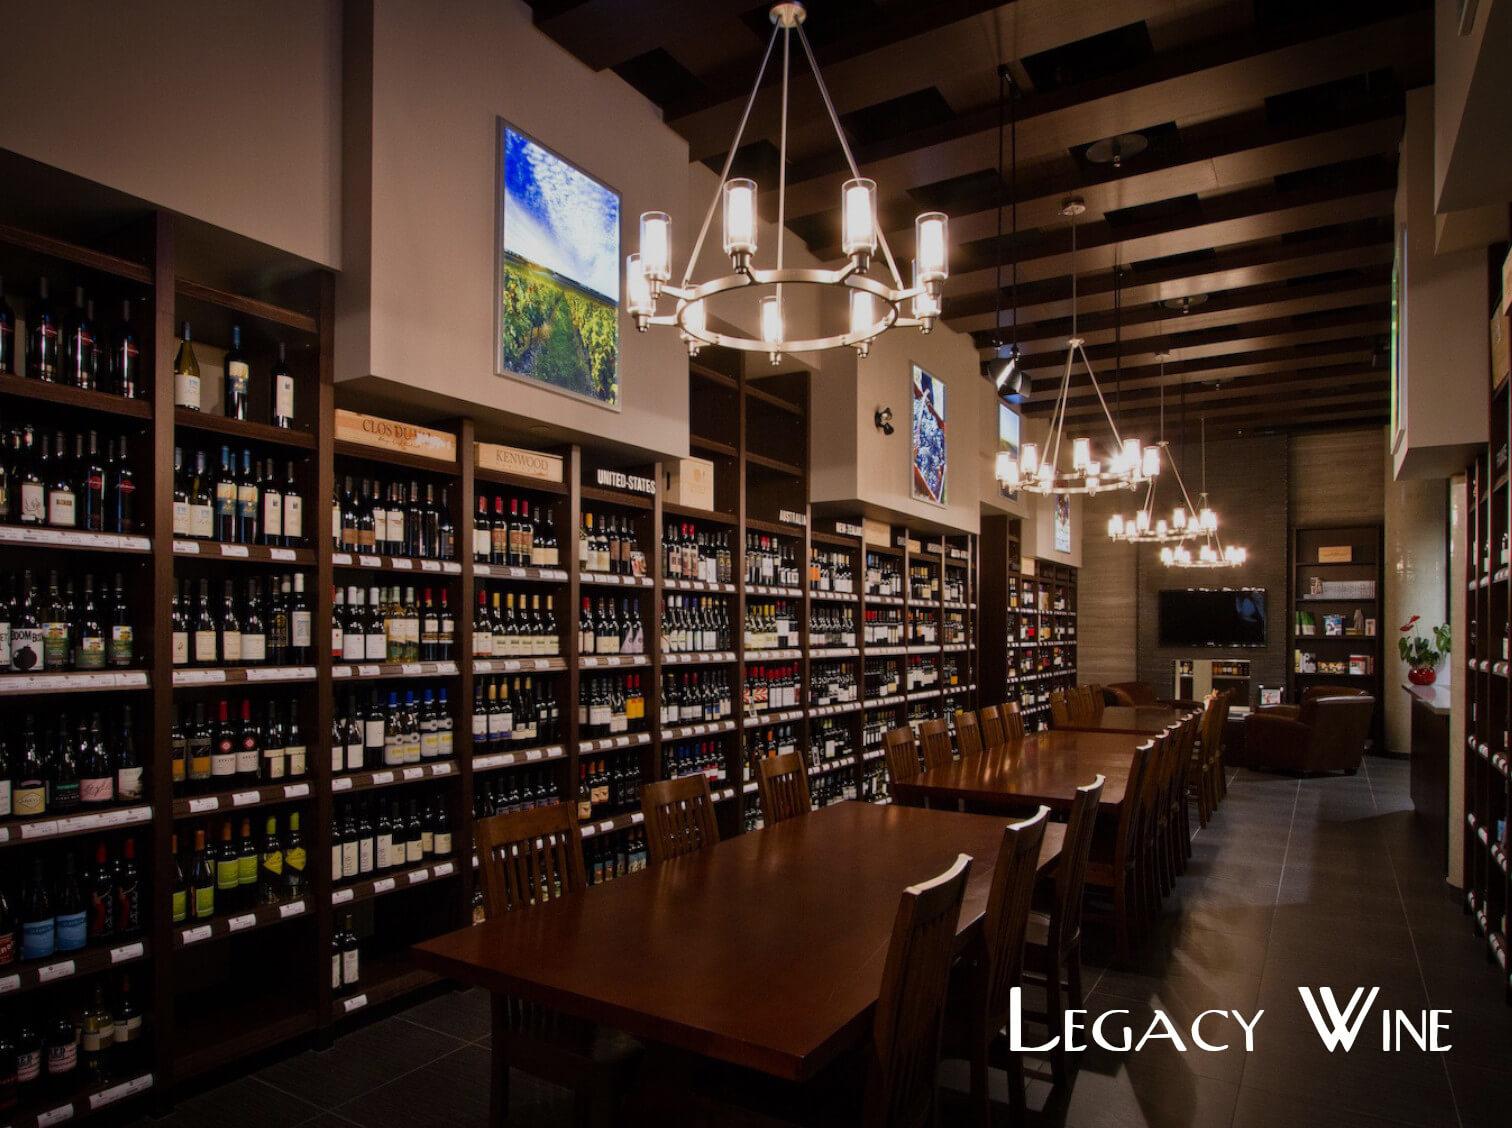 Legacy Wine